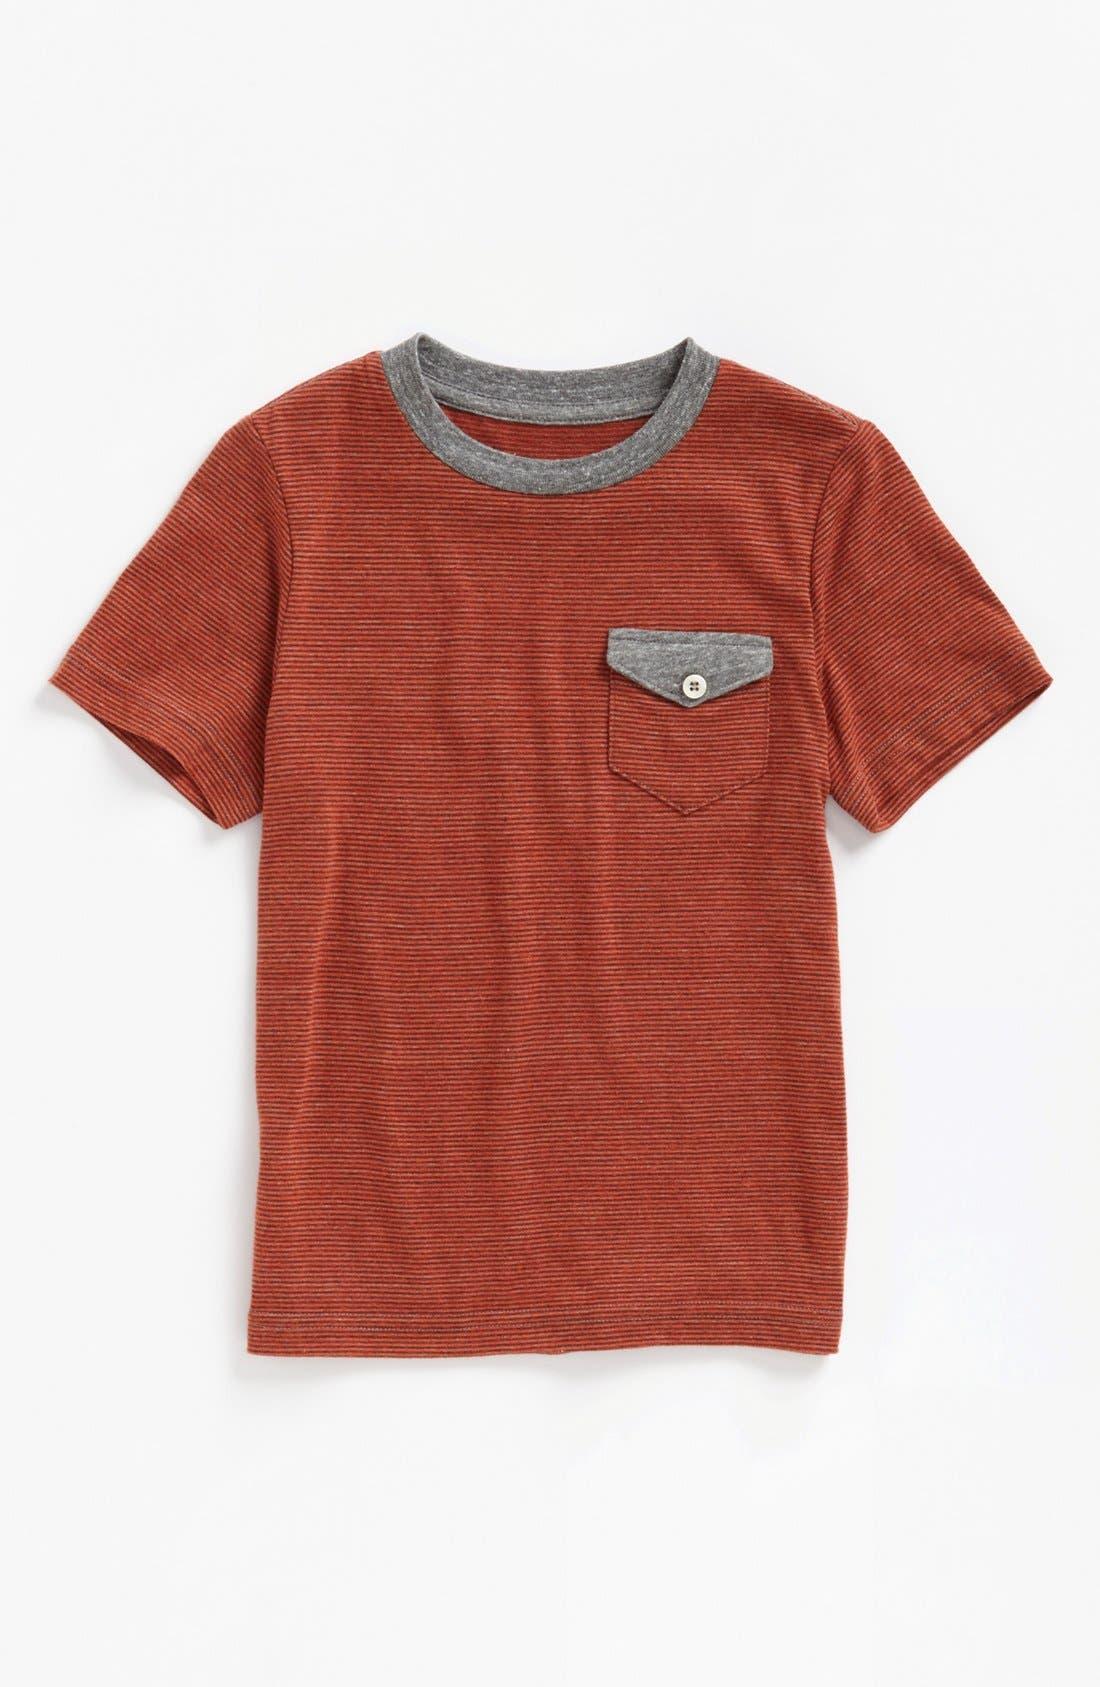 Alternate Image 1 Selected - Tucker + Tate 'Bretland' T-Shirt (Big Boys)